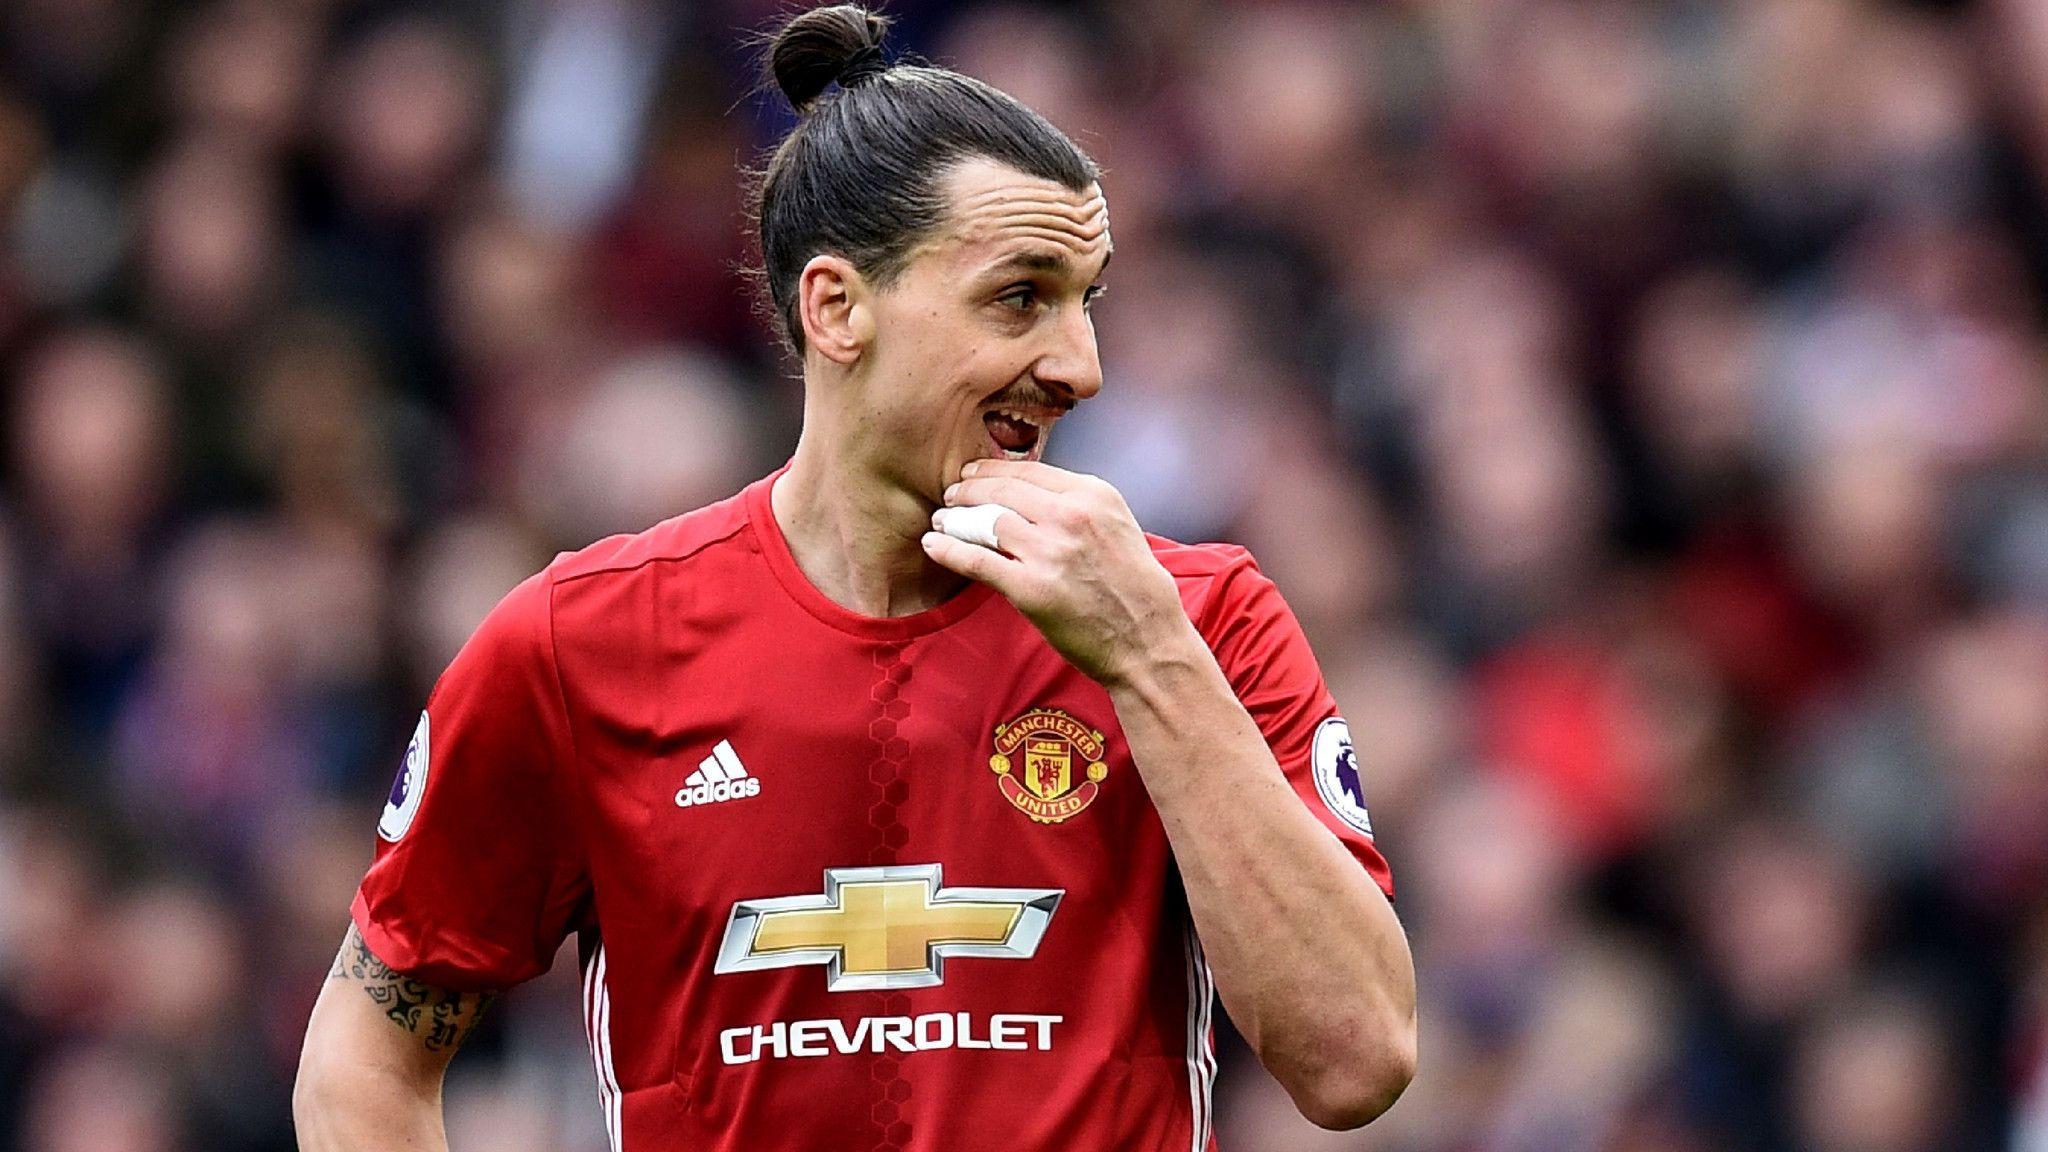 Galaxy's play for Zlatan Ibrahimovic built around more than money